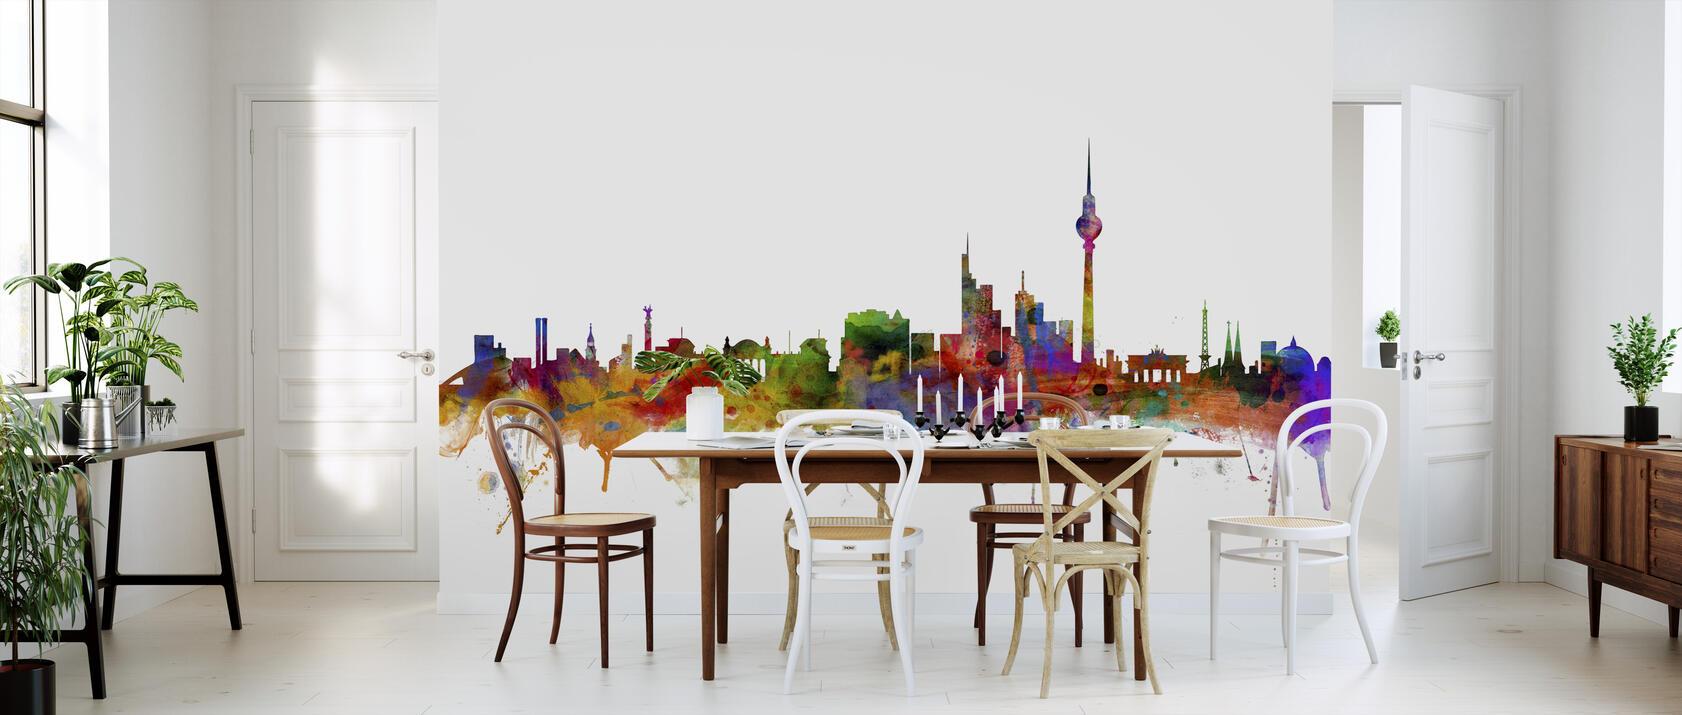 berlin skyline beliebte fototapete photowall. Black Bedroom Furniture Sets. Home Design Ideas